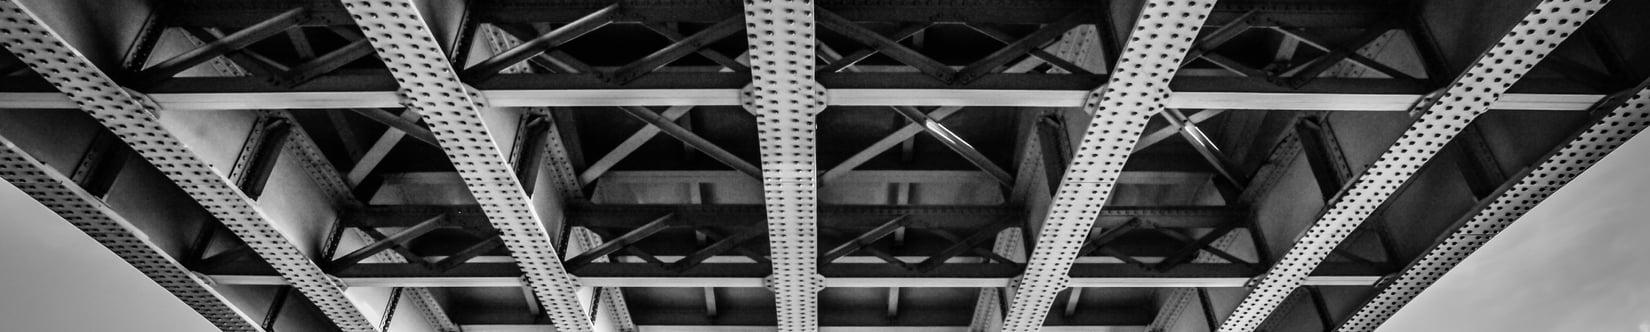 bridgespan-with-rivets.png